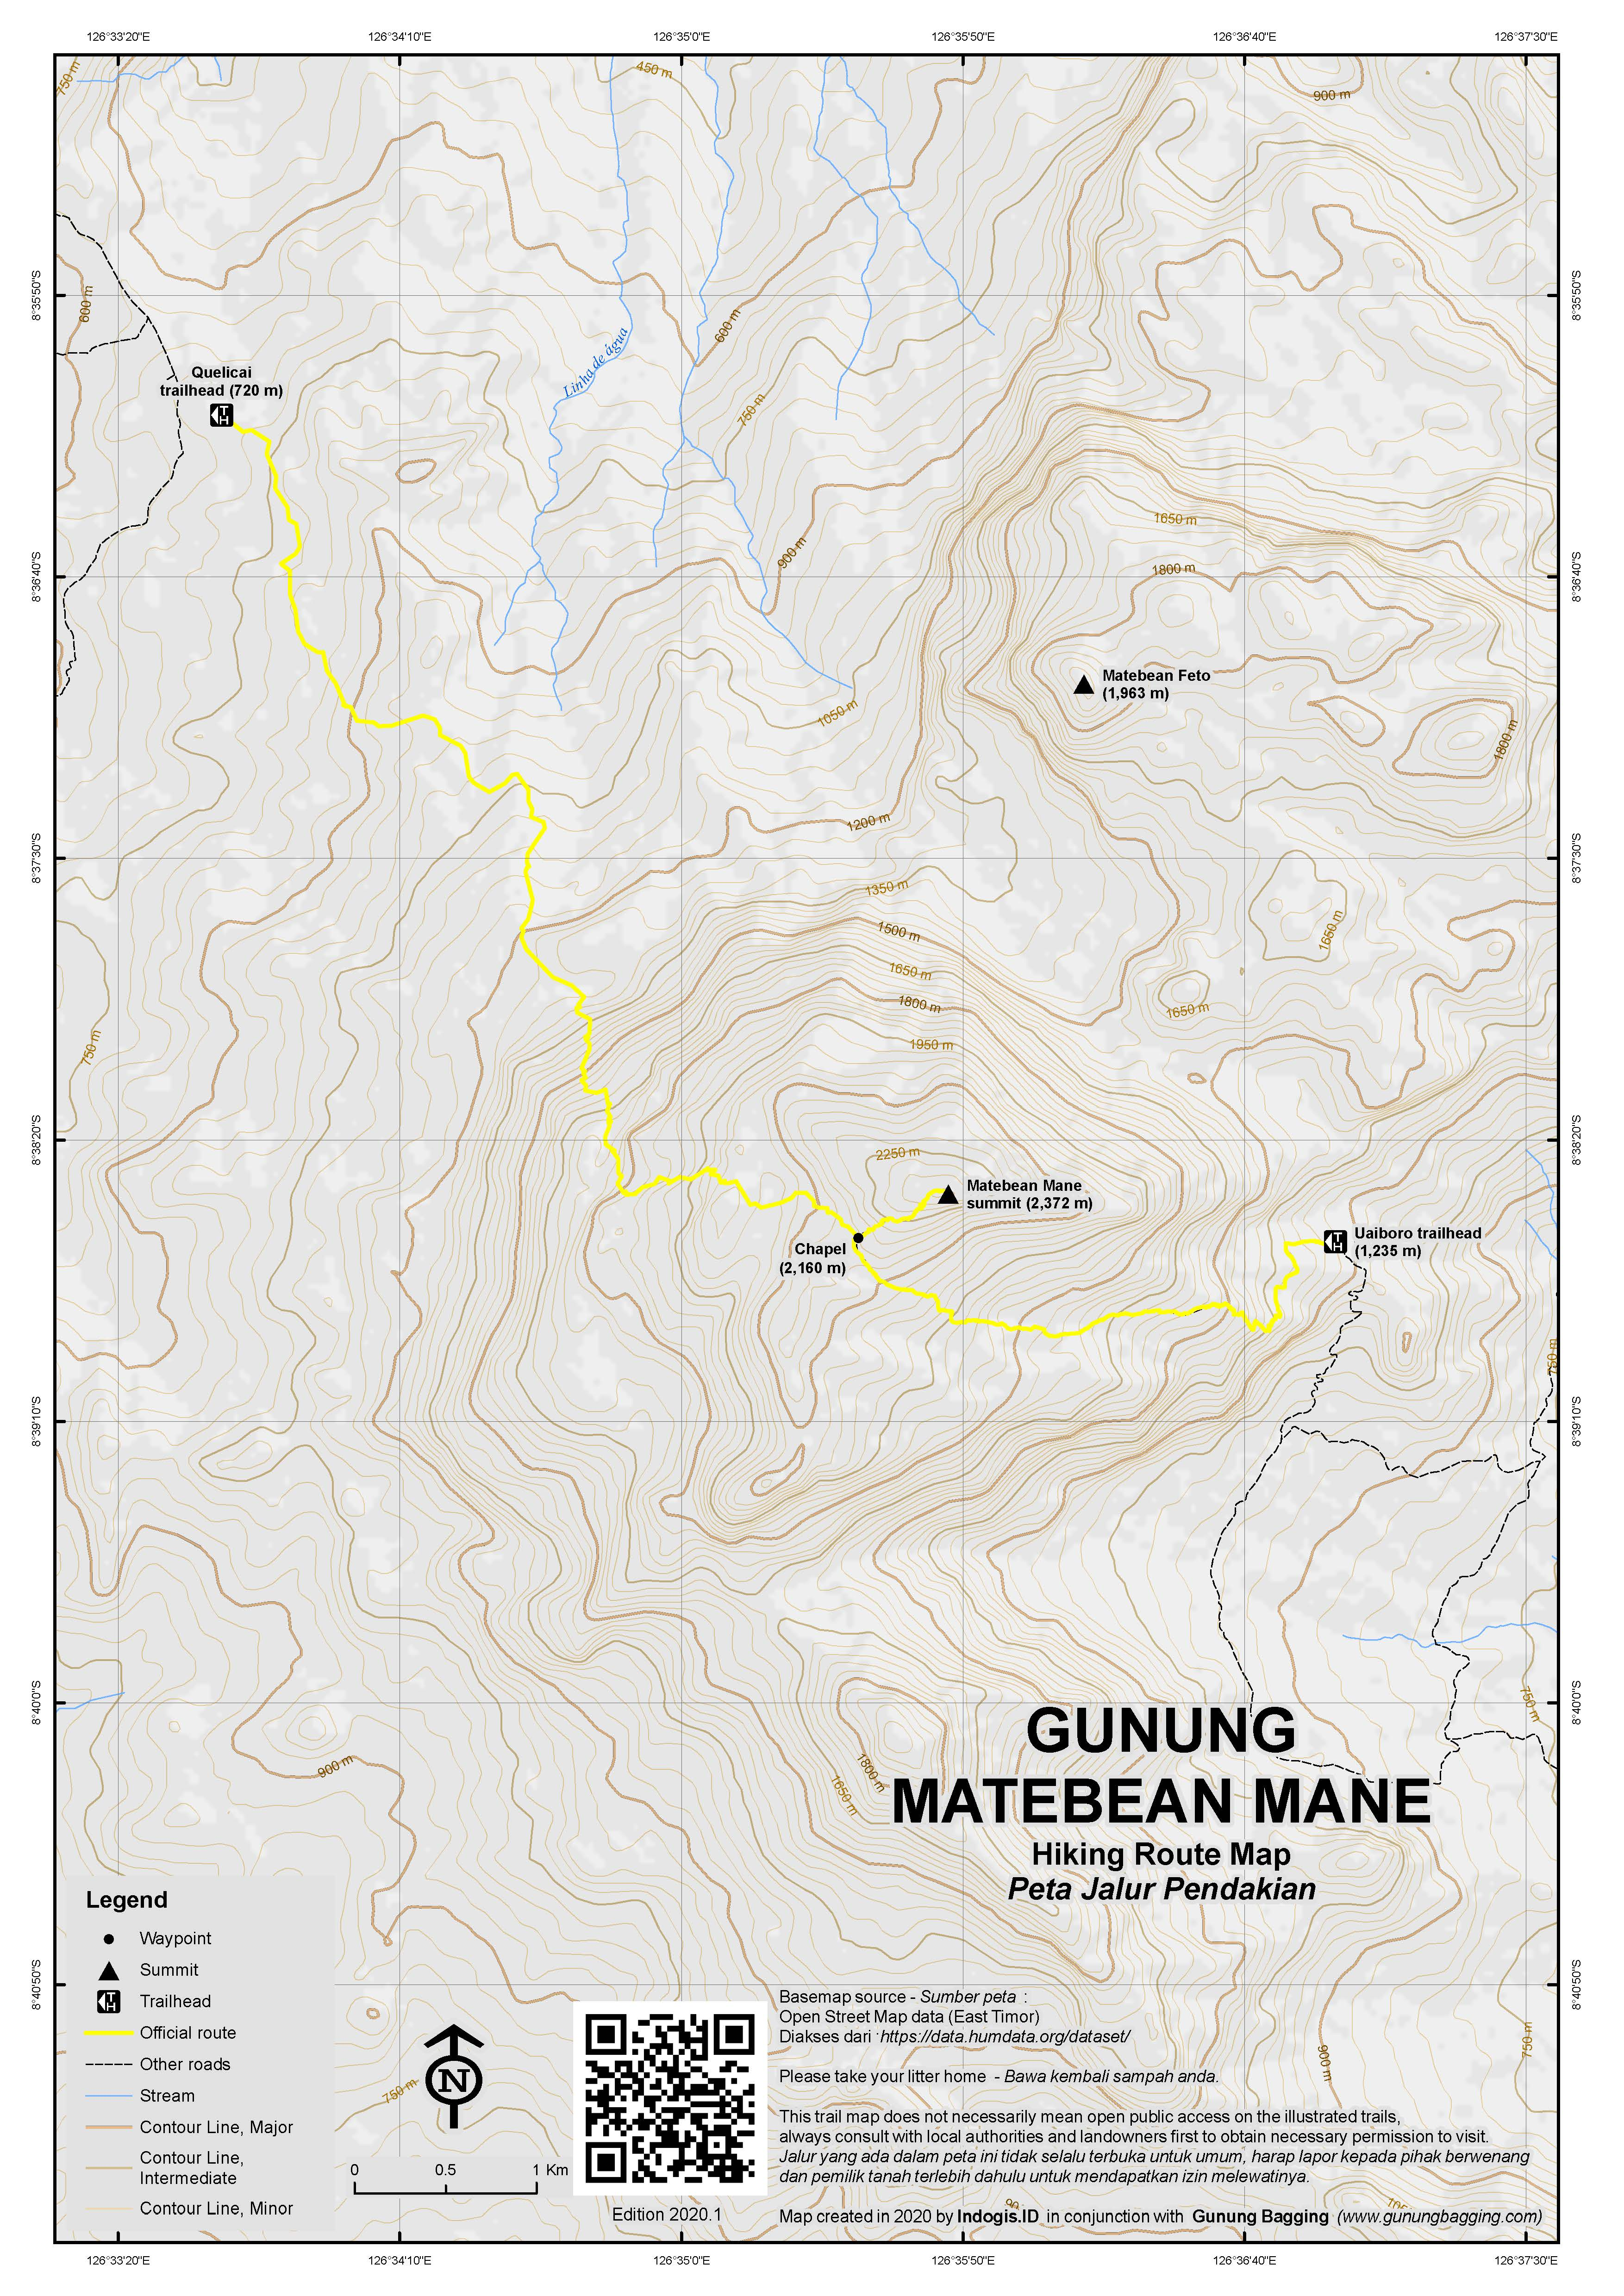 Peta Jalur Pendakian Gunung Matebean Mane